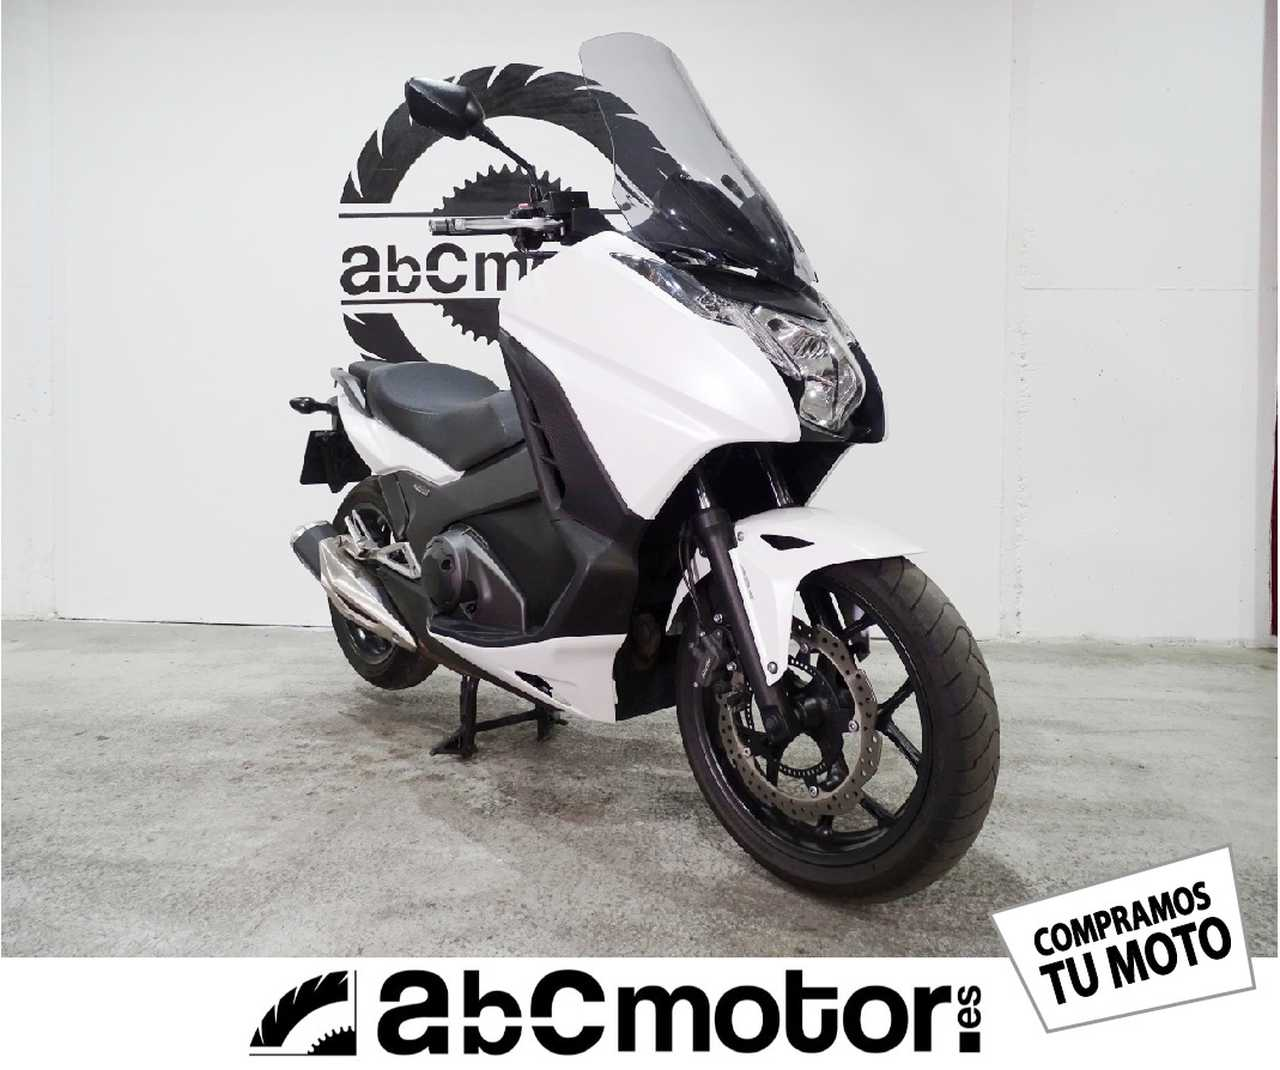 Honda Integra 750 S ABS  - Foto 1